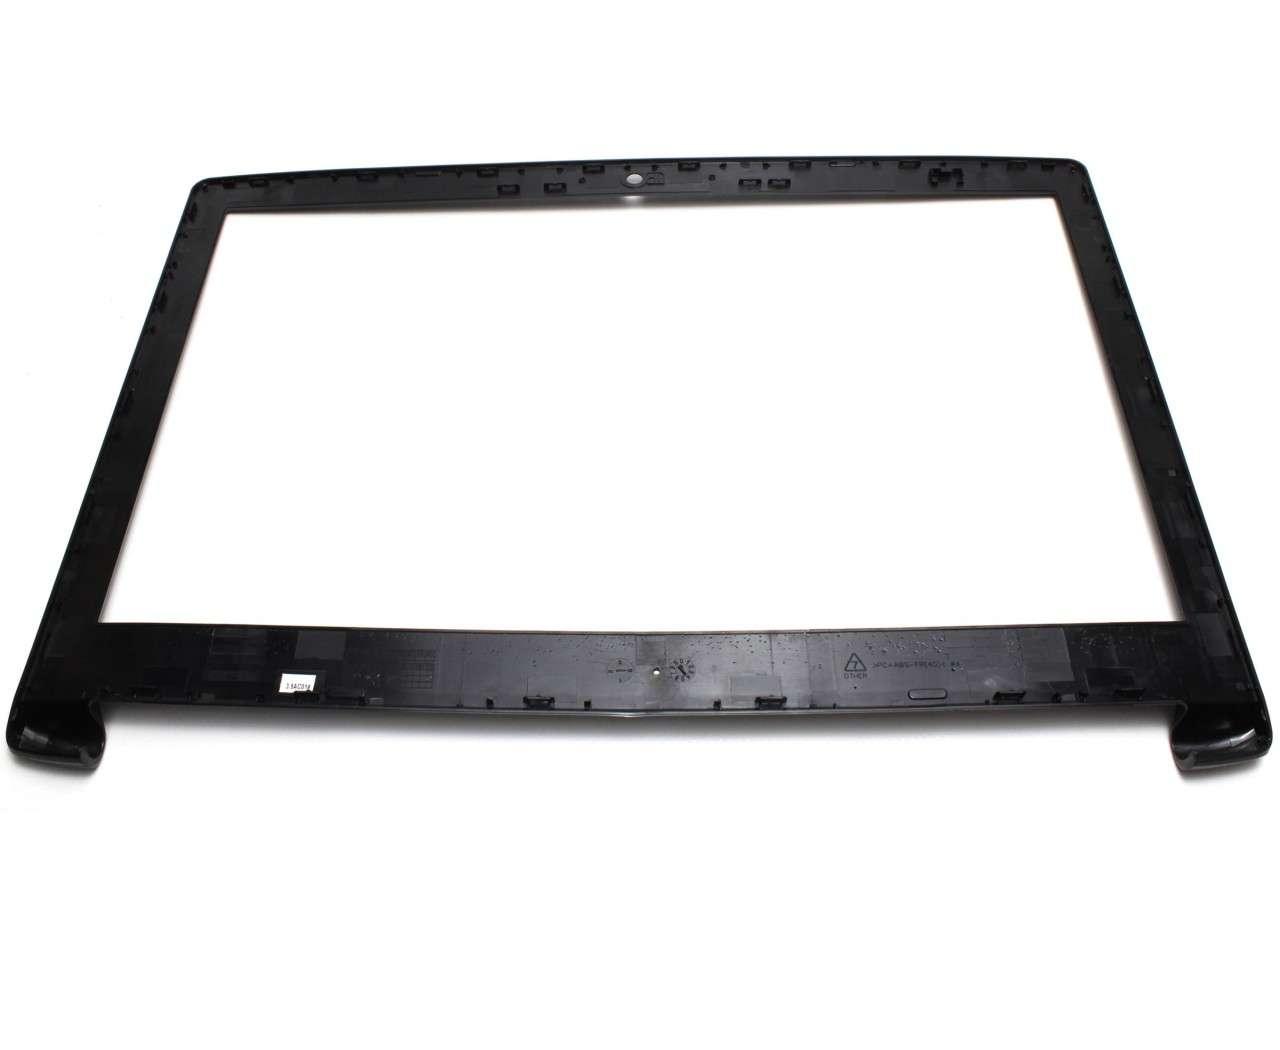 Rama Display Acer Aspire A315-53G Bezel Front Cover Neagra imagine powerlaptop.ro 2021